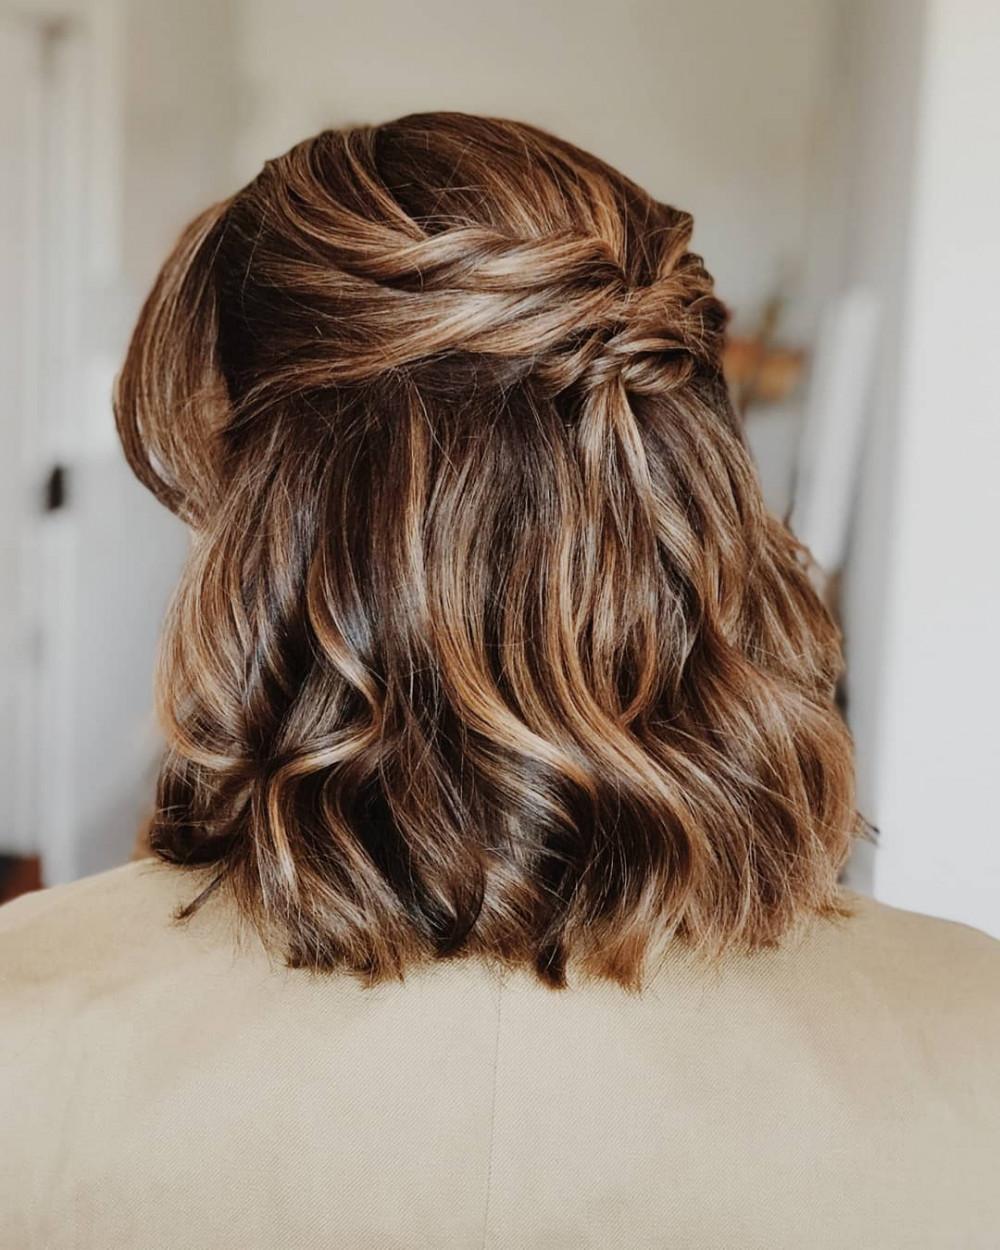 Bridesmaid Rita - Make Me Bridal Artist: let's hair. #weddinghair #hairup #bridesmaid #weddingguests #bridesmaidhair #natural #loosehairup #relaxedhairup #halfuphair #bridesmaidshair #halfuphalfdown #loosewaves #naturallook #effortlesshair #twistedupdo #halfup